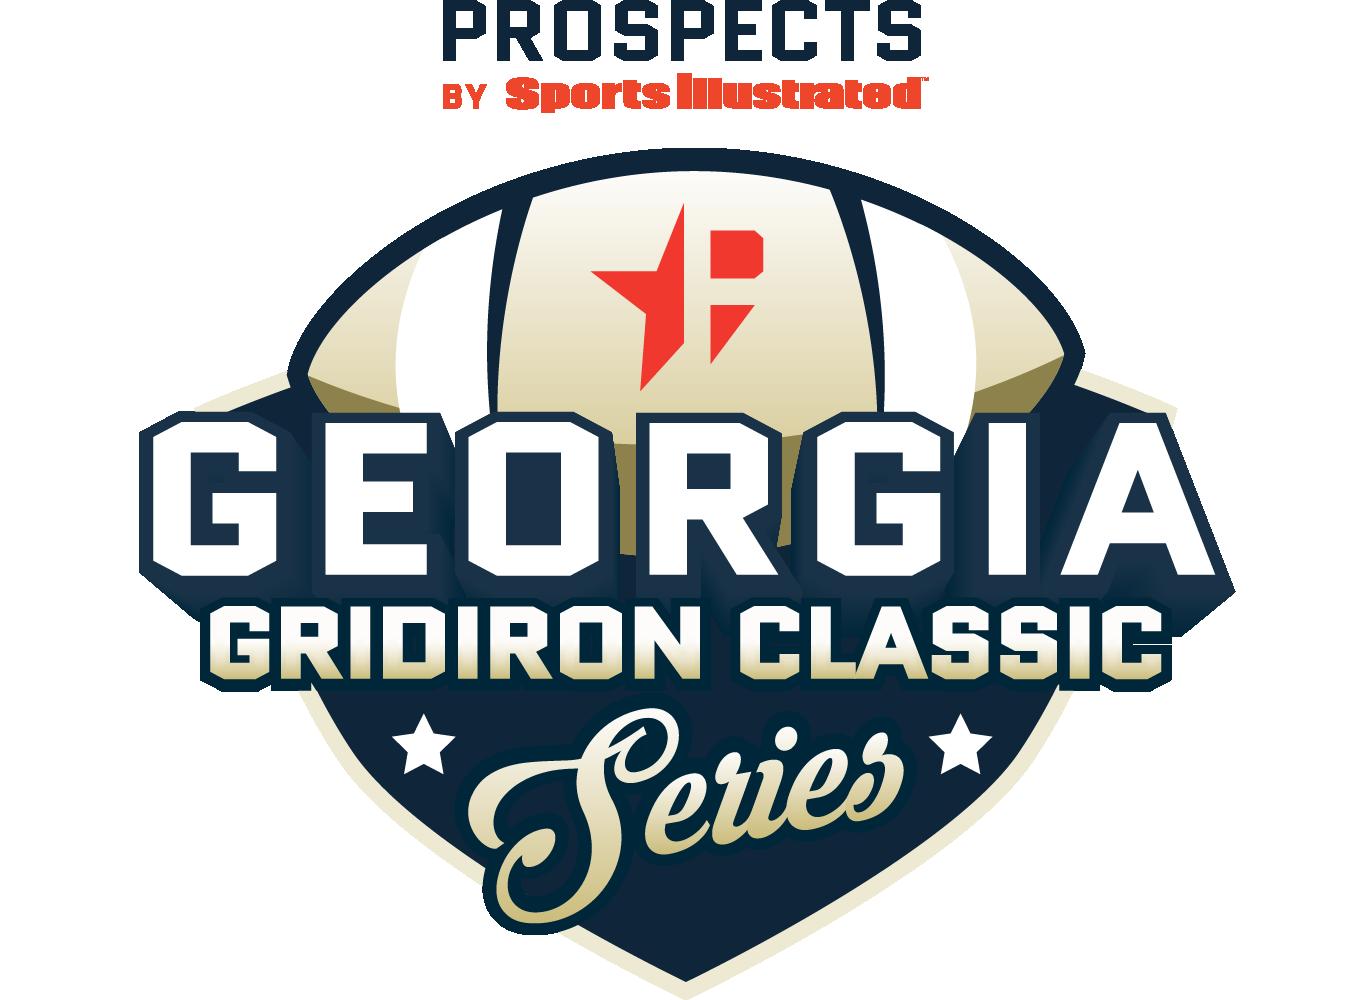 Prospects Gridiron Classic Series- Georgia logo